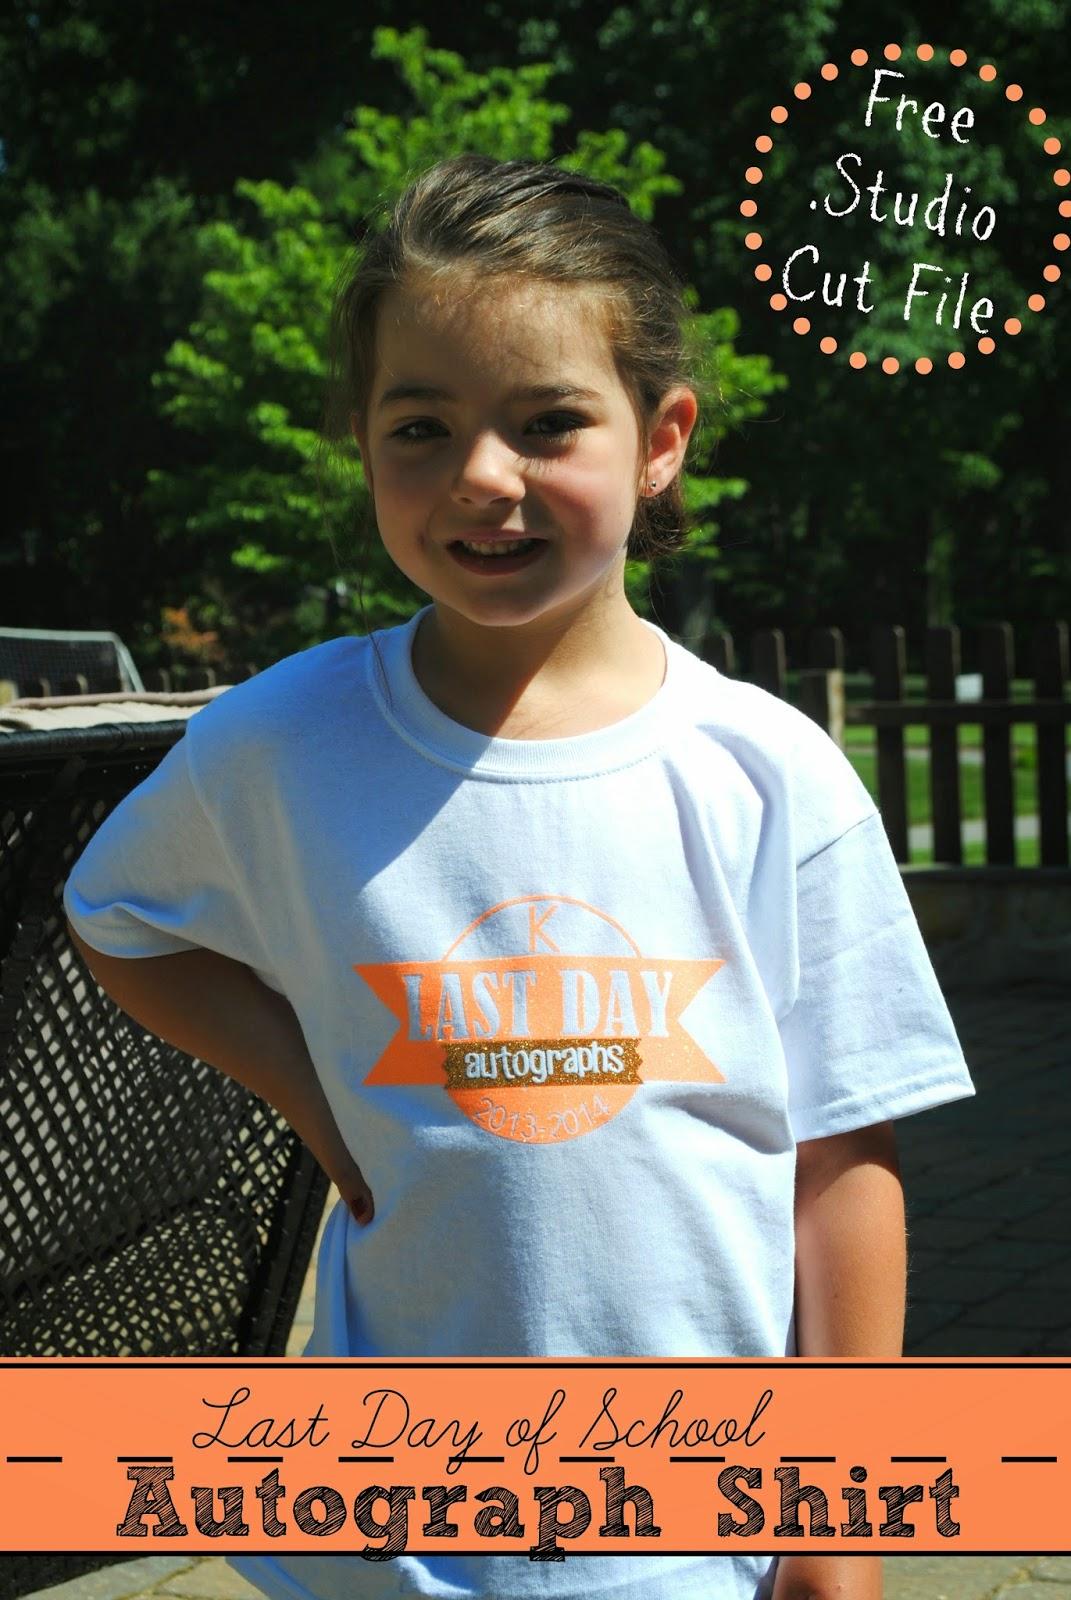 http://silhouetteschool.blogspot.com/2014/06/last-day-of-school-autograph-shirt-free.html